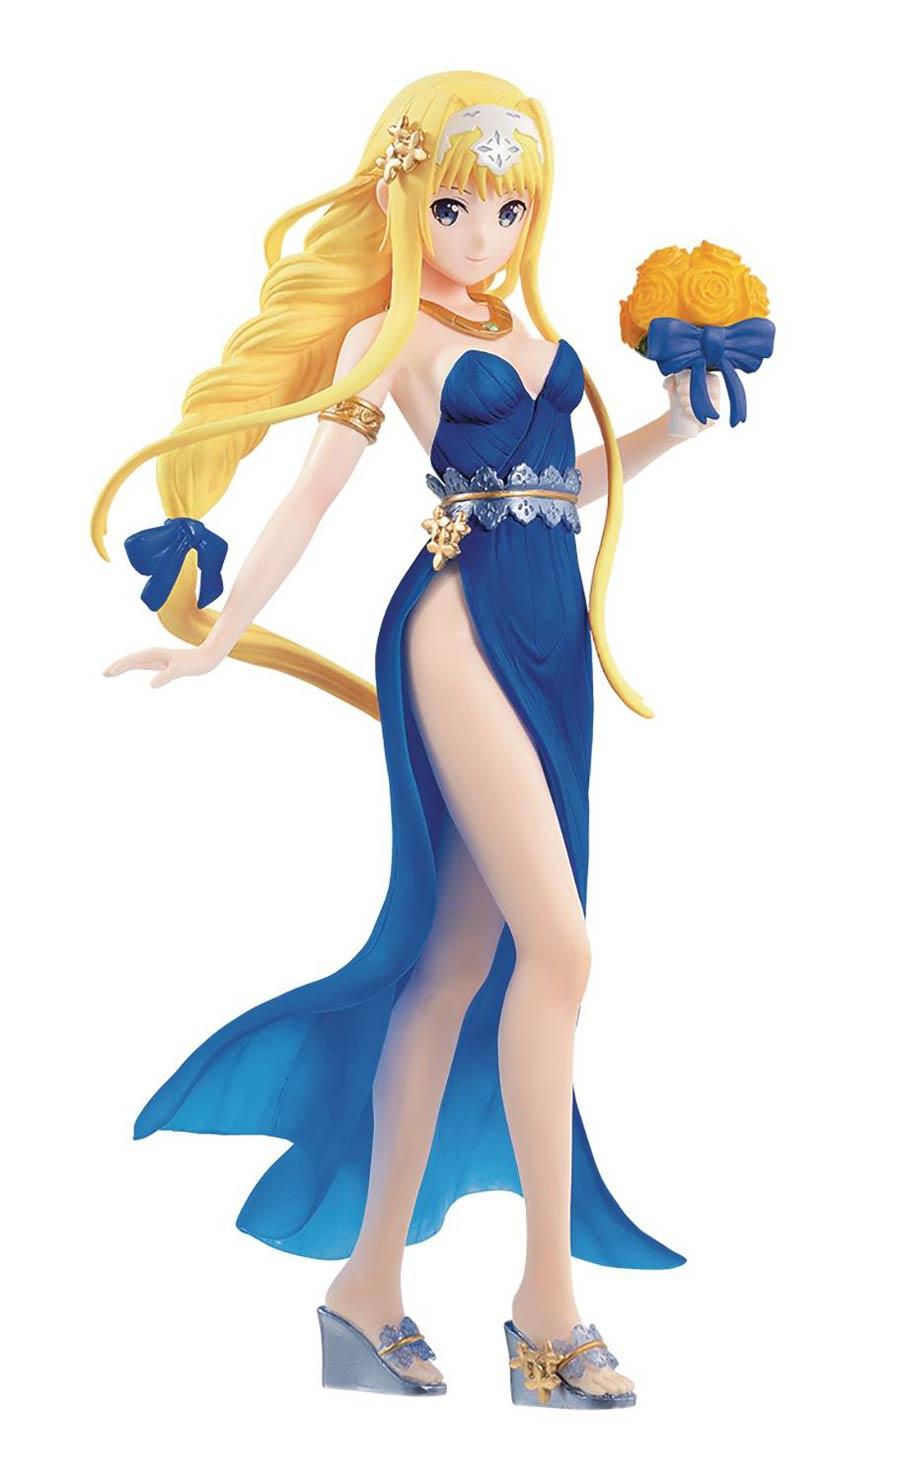 Sword Art Online 10th Anniversary Ichiban - Alice Party Dress Figure